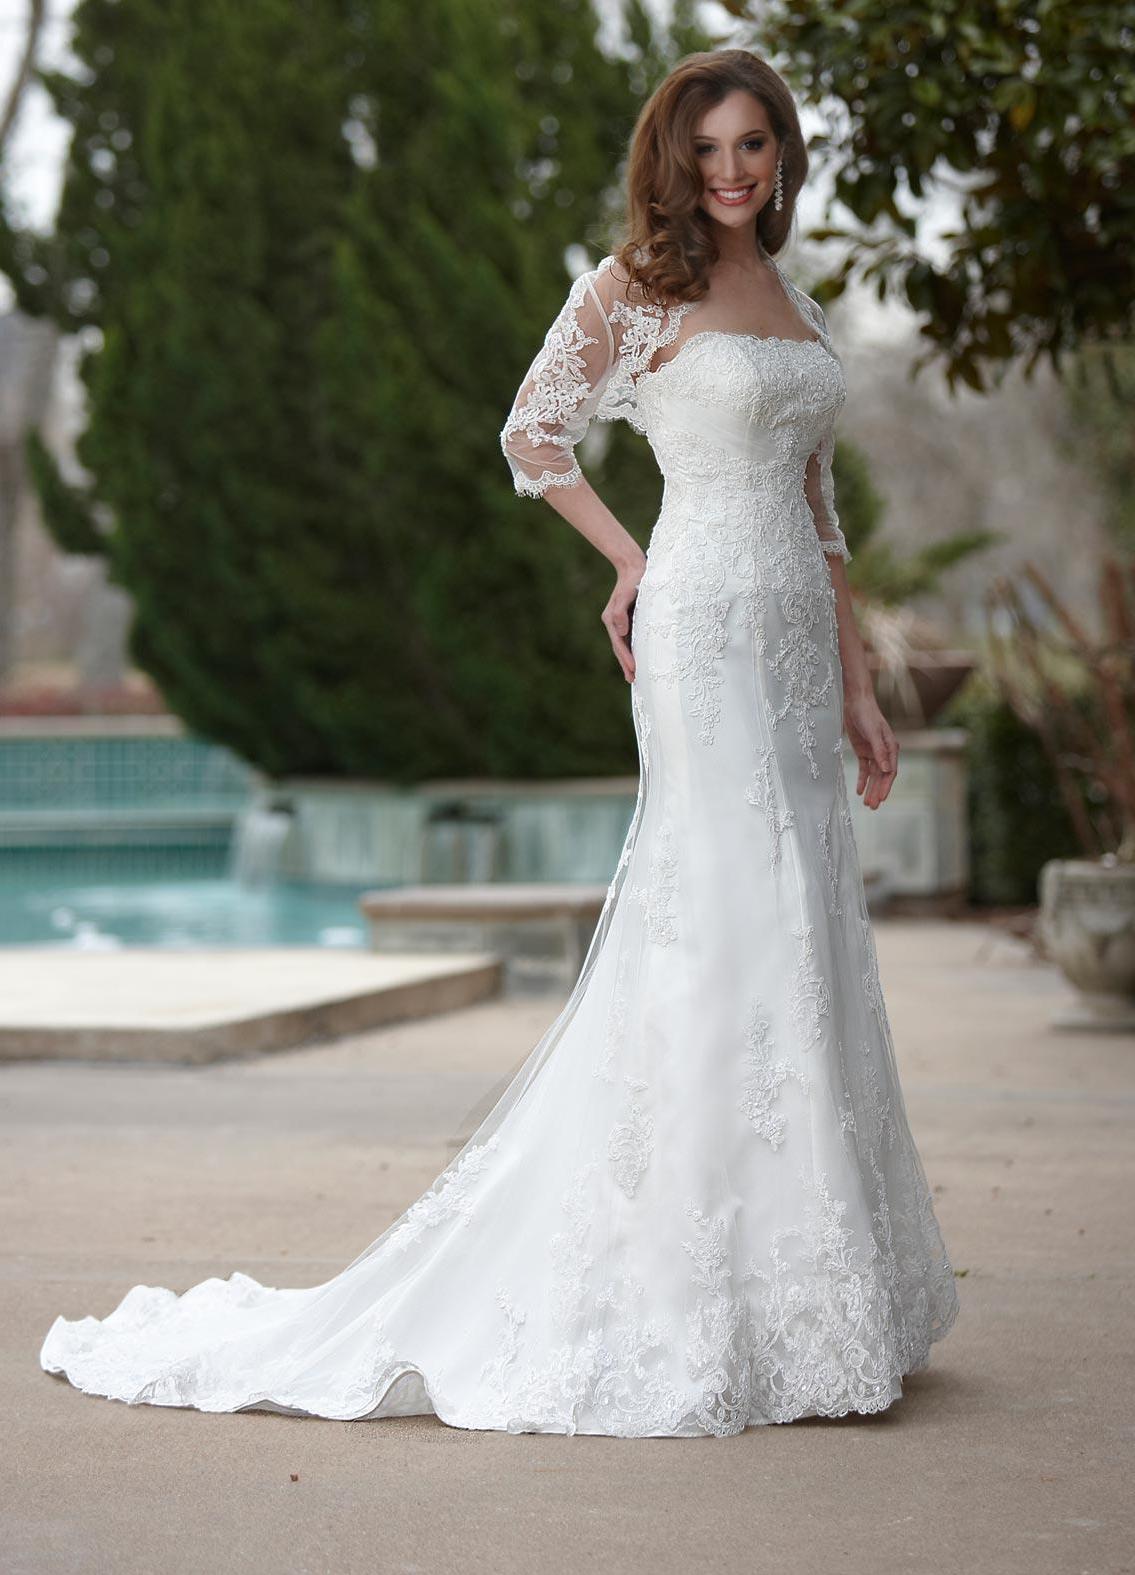 Waist Bridal Dresses With